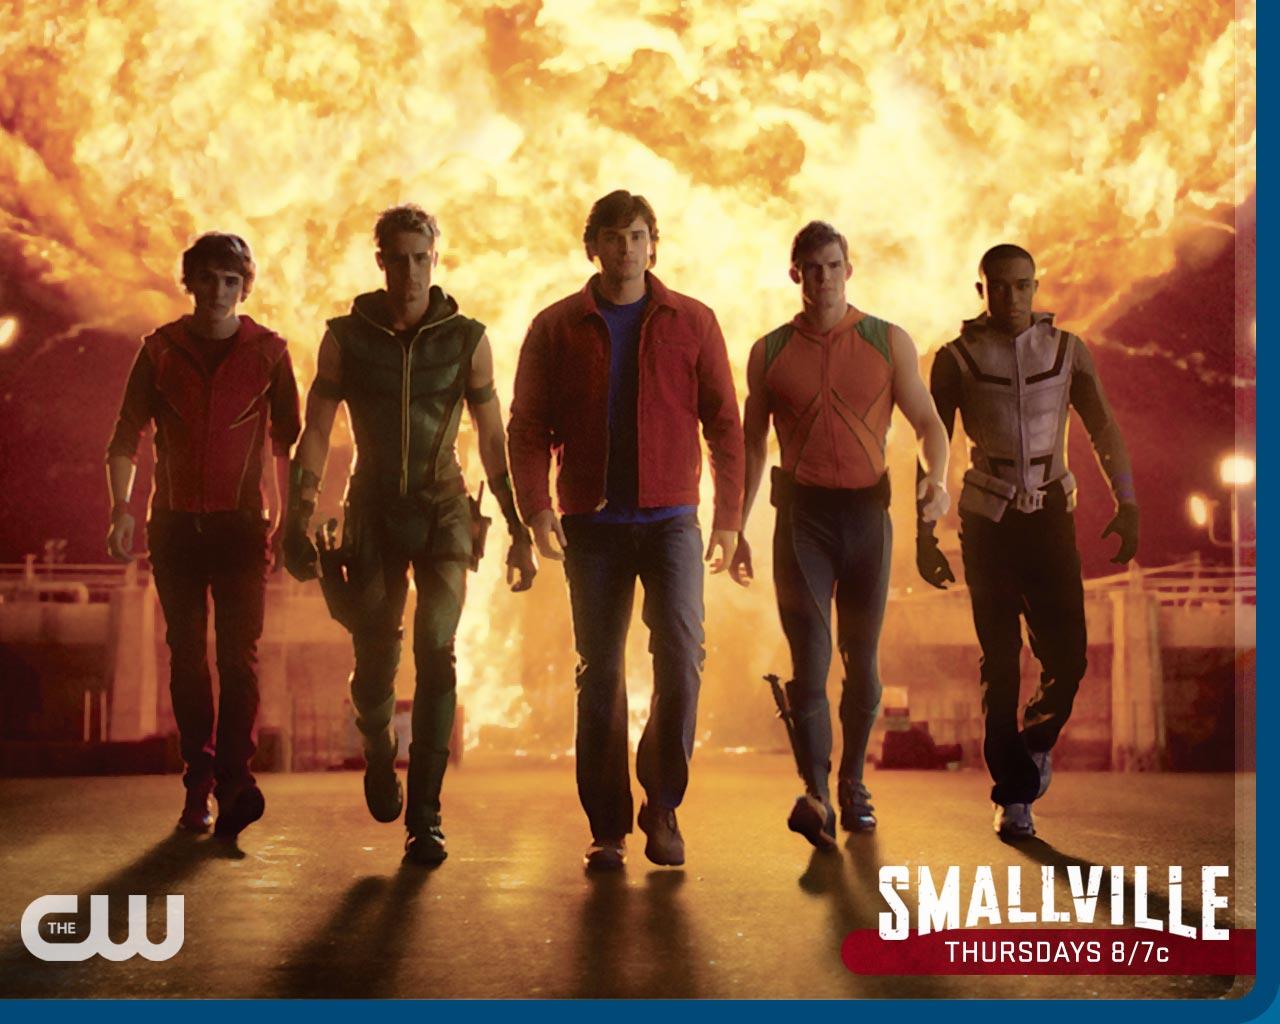 Smallville Wallpapers - Wallpaper Cave  |Smallville